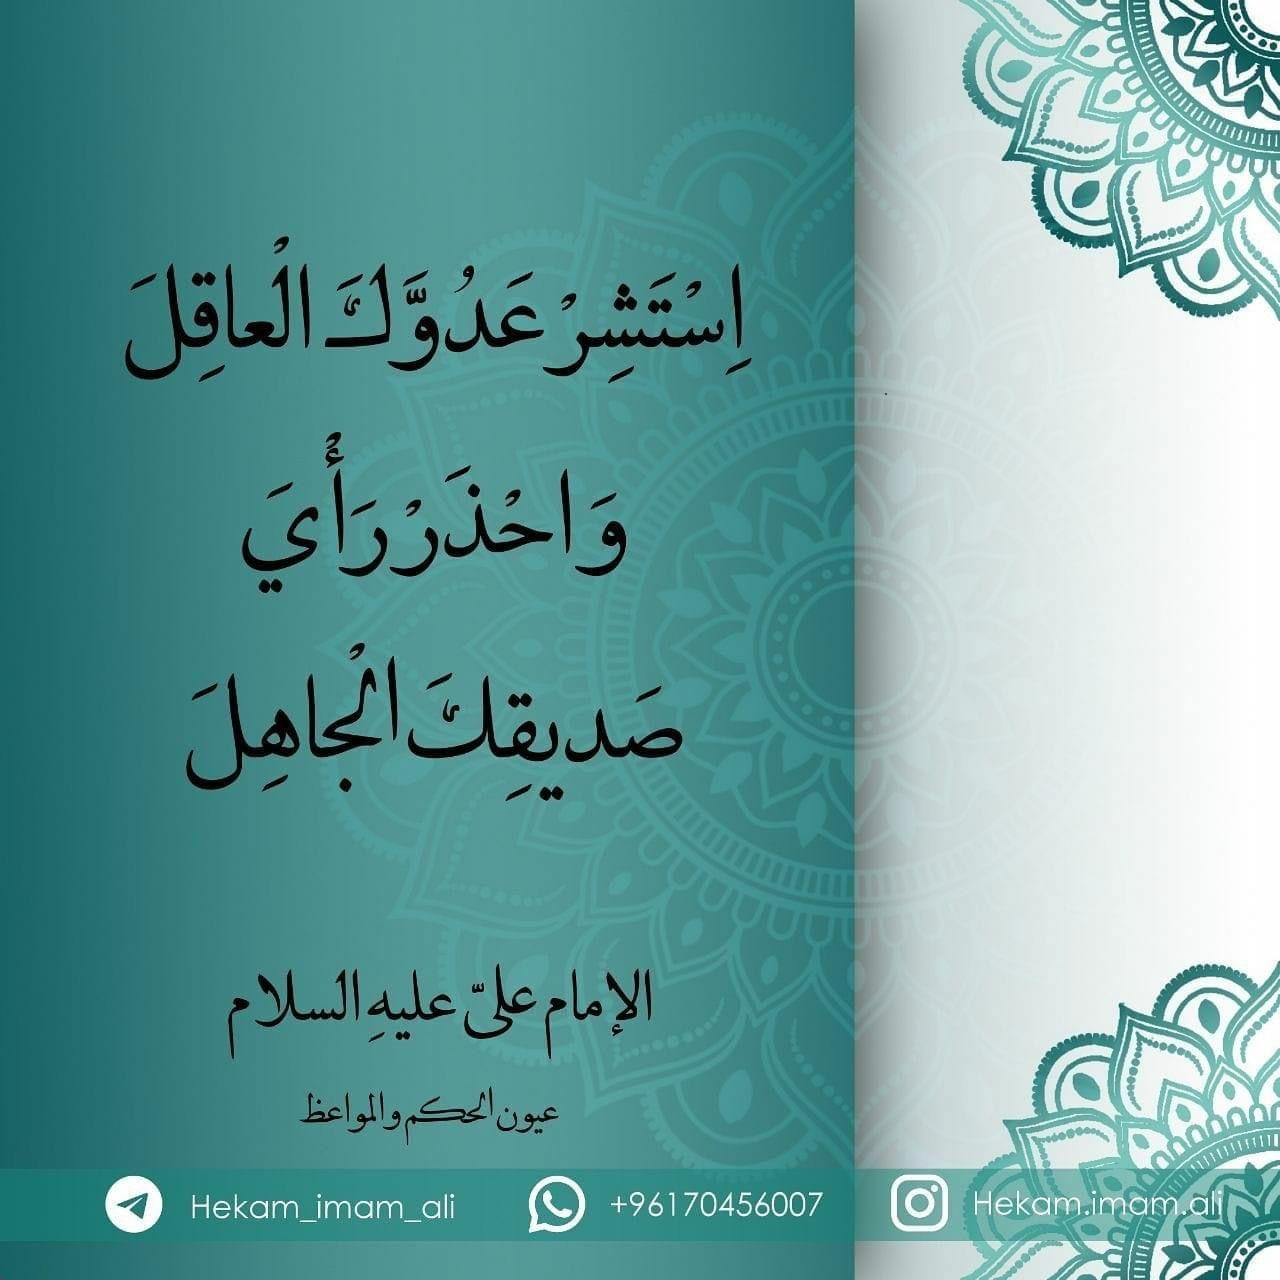 Pin By Aldahan On أماكن تستحق الزيارة Book Cover Lie Imam Ali